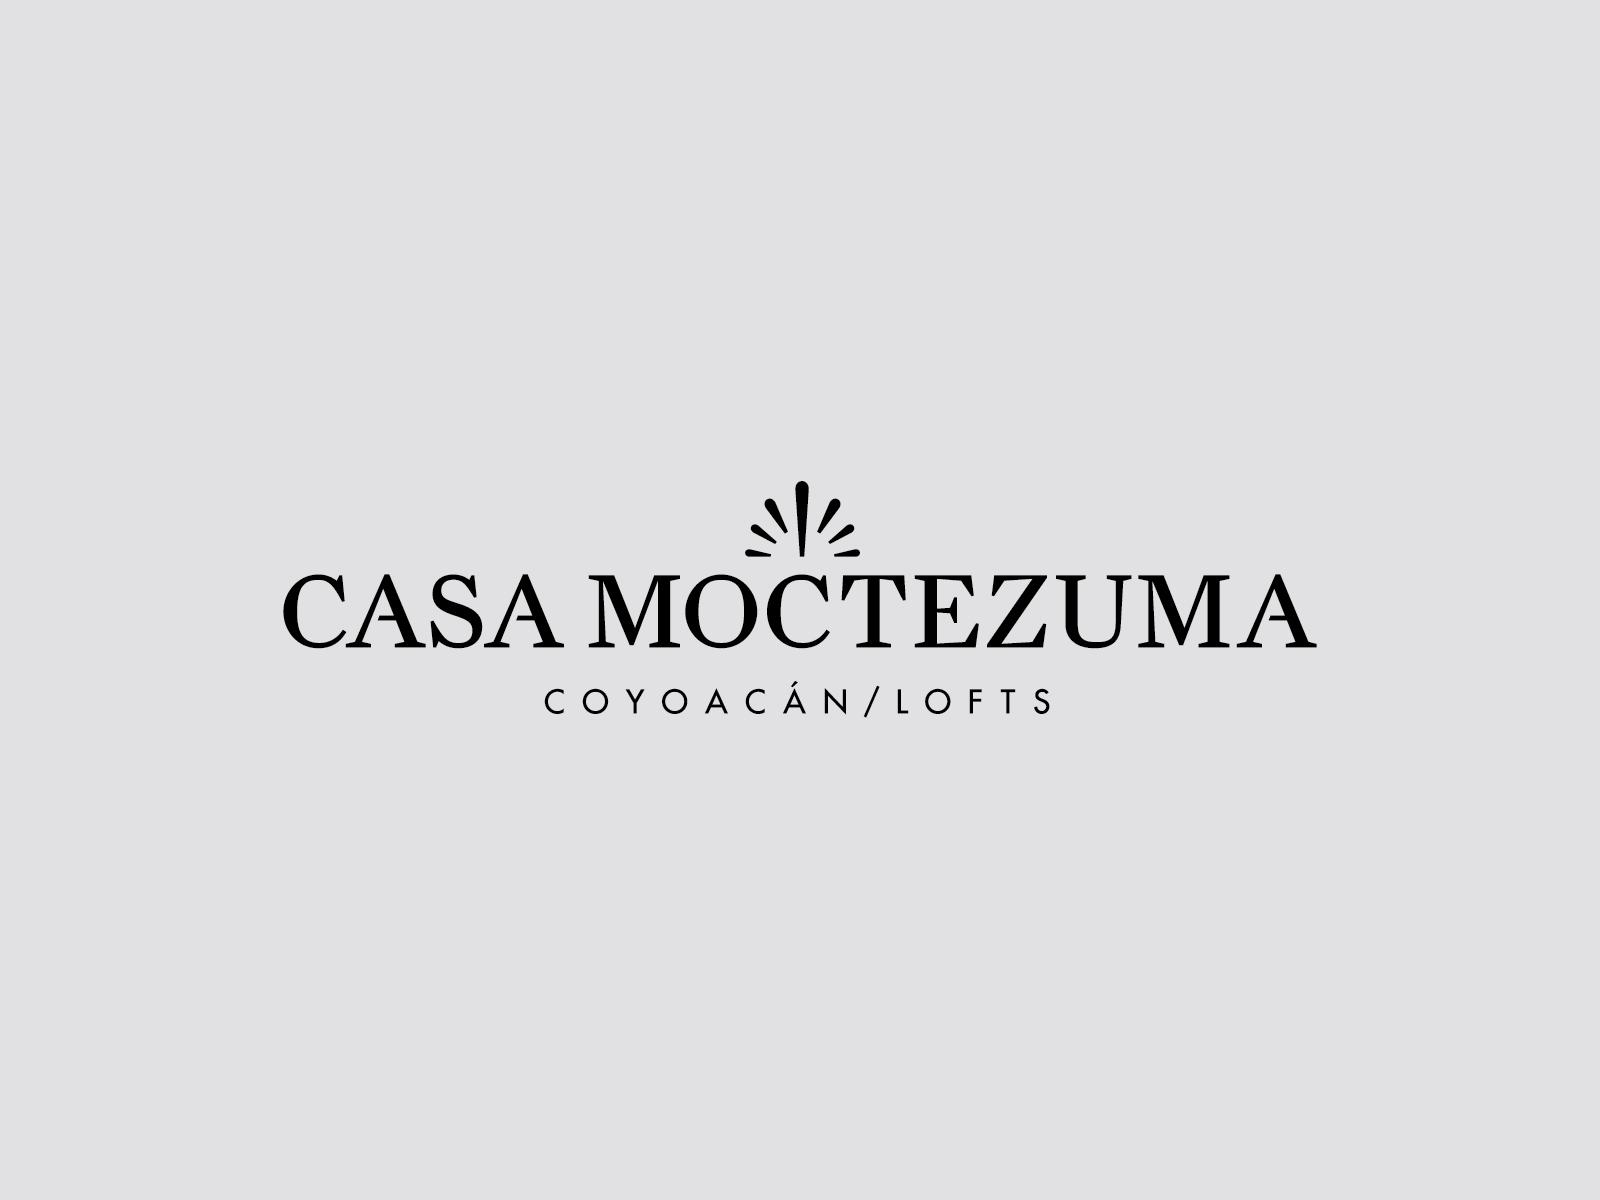 Casa Moctezuma. Hotel